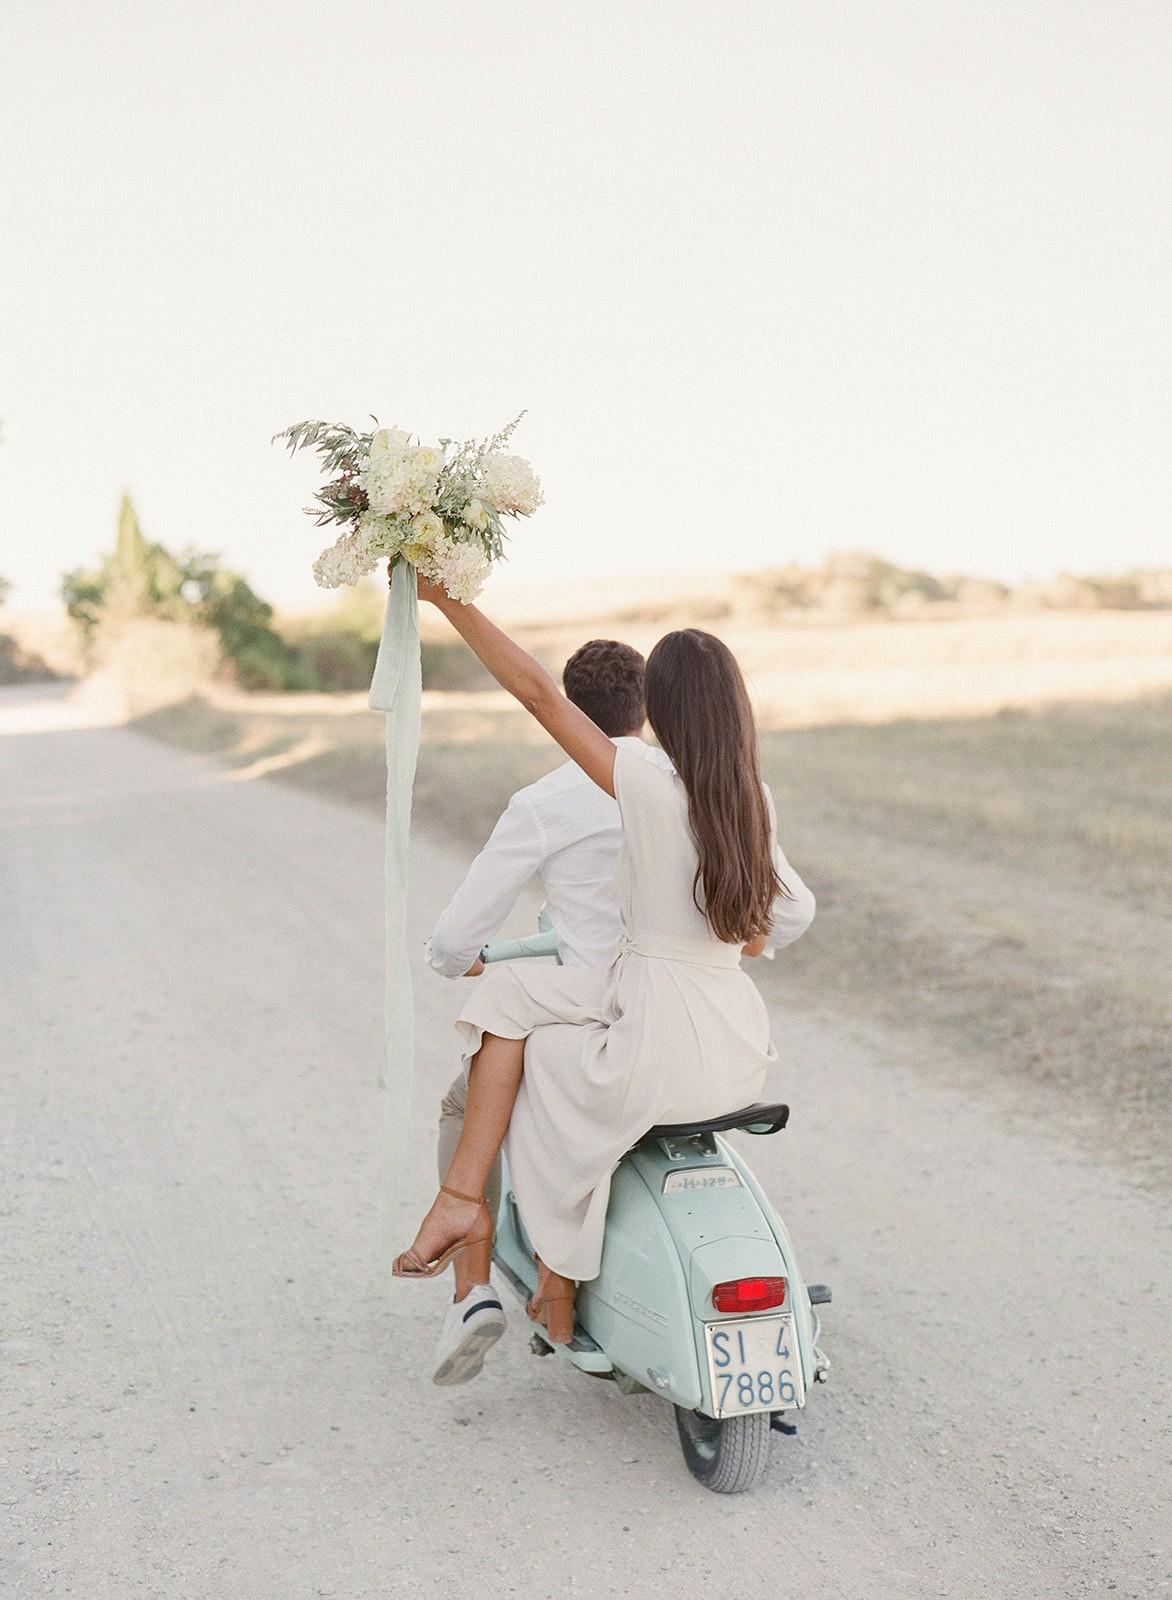 ROMANTIC SUNSET ENGAGEMENT SESSION AT CHAPEL VITALETA IN TUSCANY